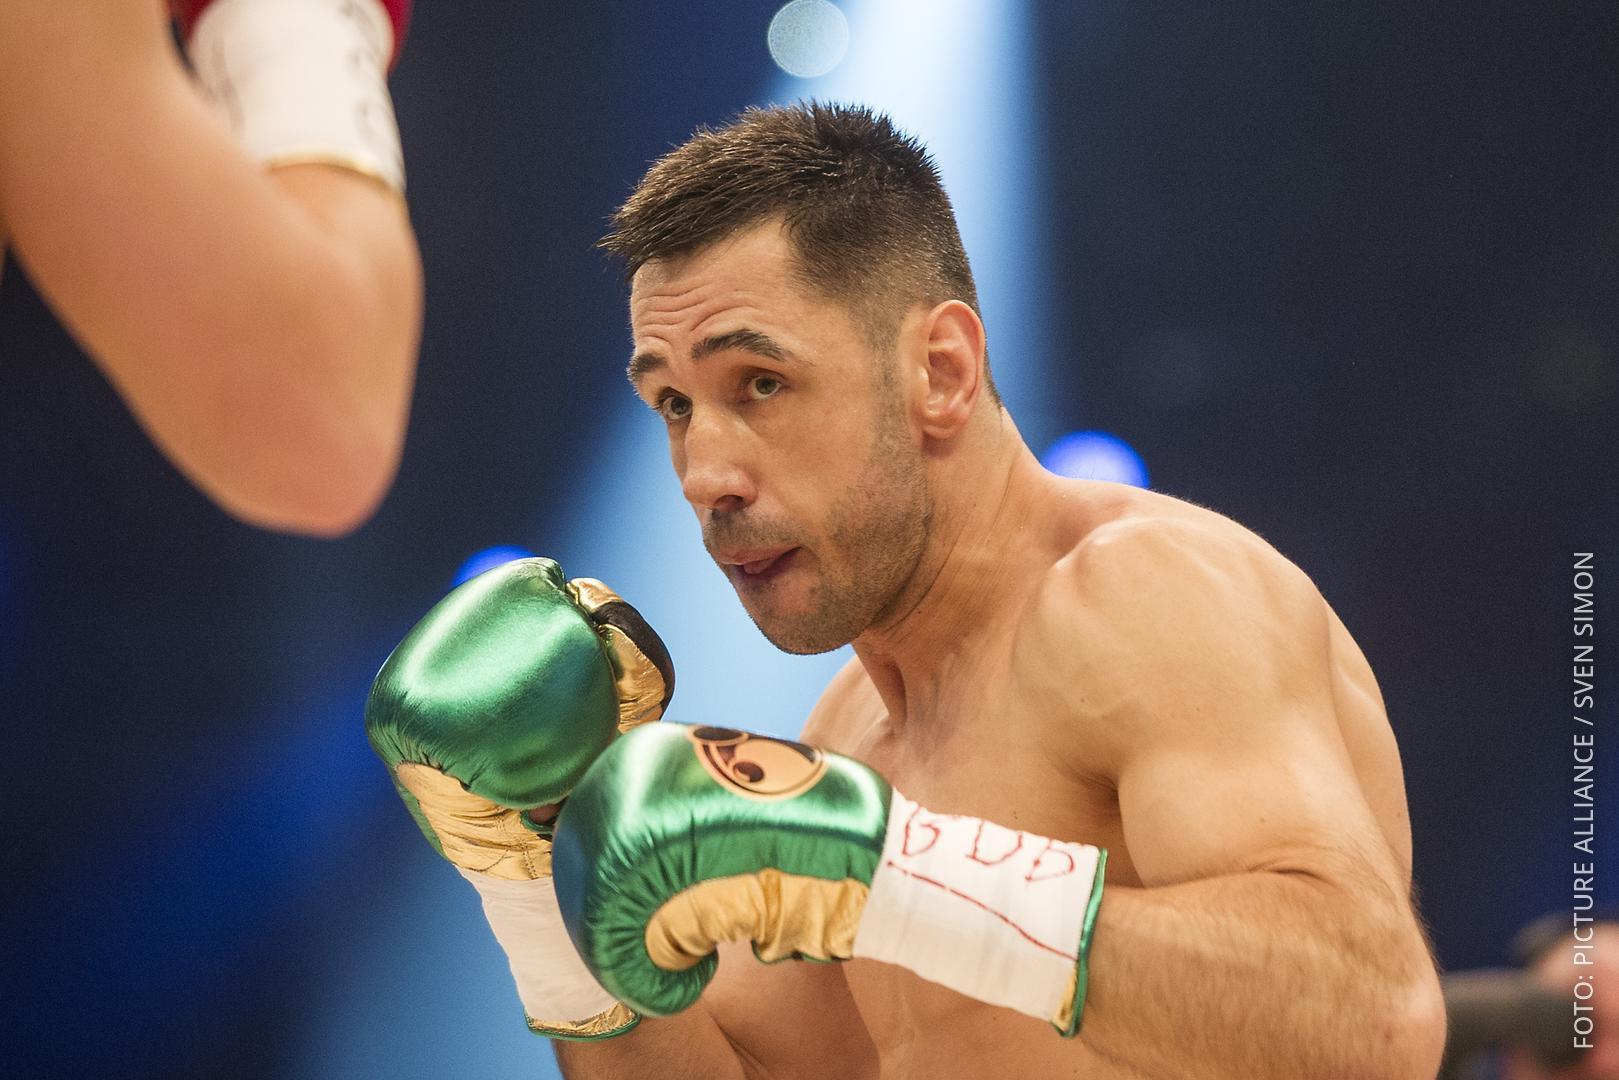 Boxer Felix Sturm im Ring mit Boxhandschuhen